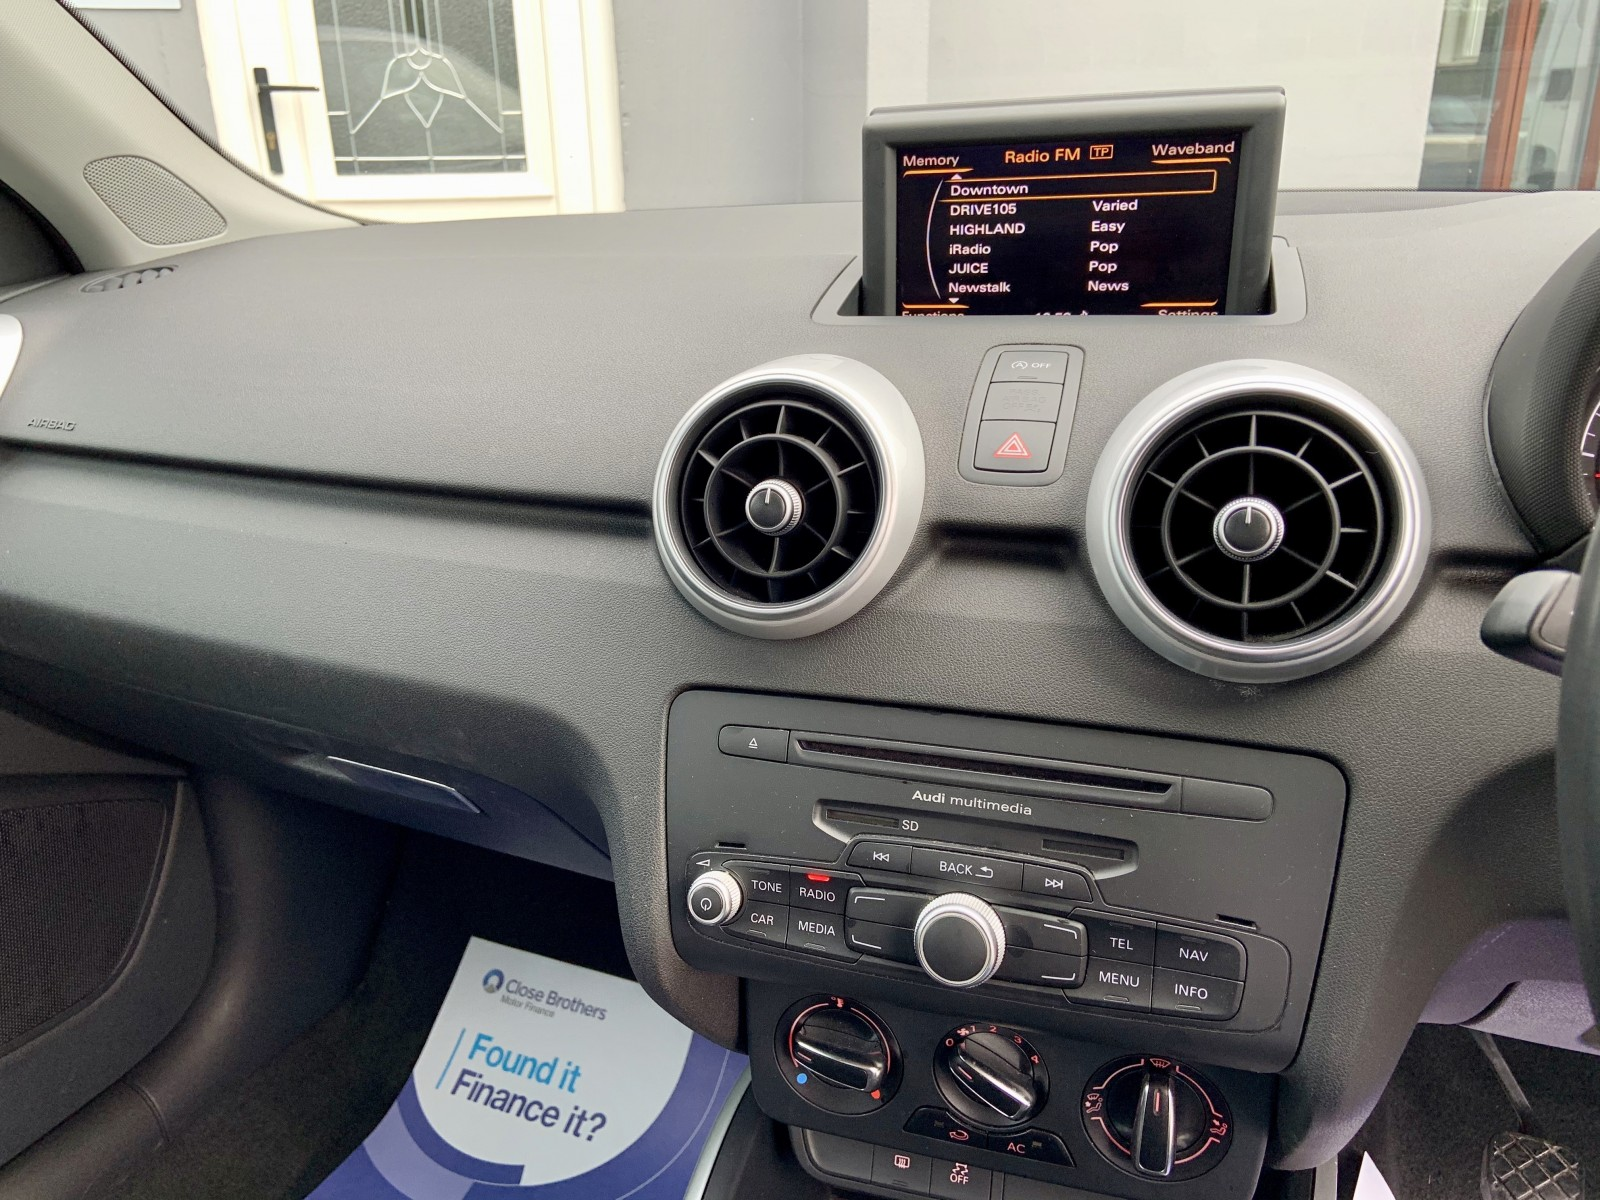 2013 Audi A1 SPORTBACK TDI SPORT Diesel Manual – BC Autosales 17A Airfield Road, Eglinton, Londonderry BT47 3PZ, UK full